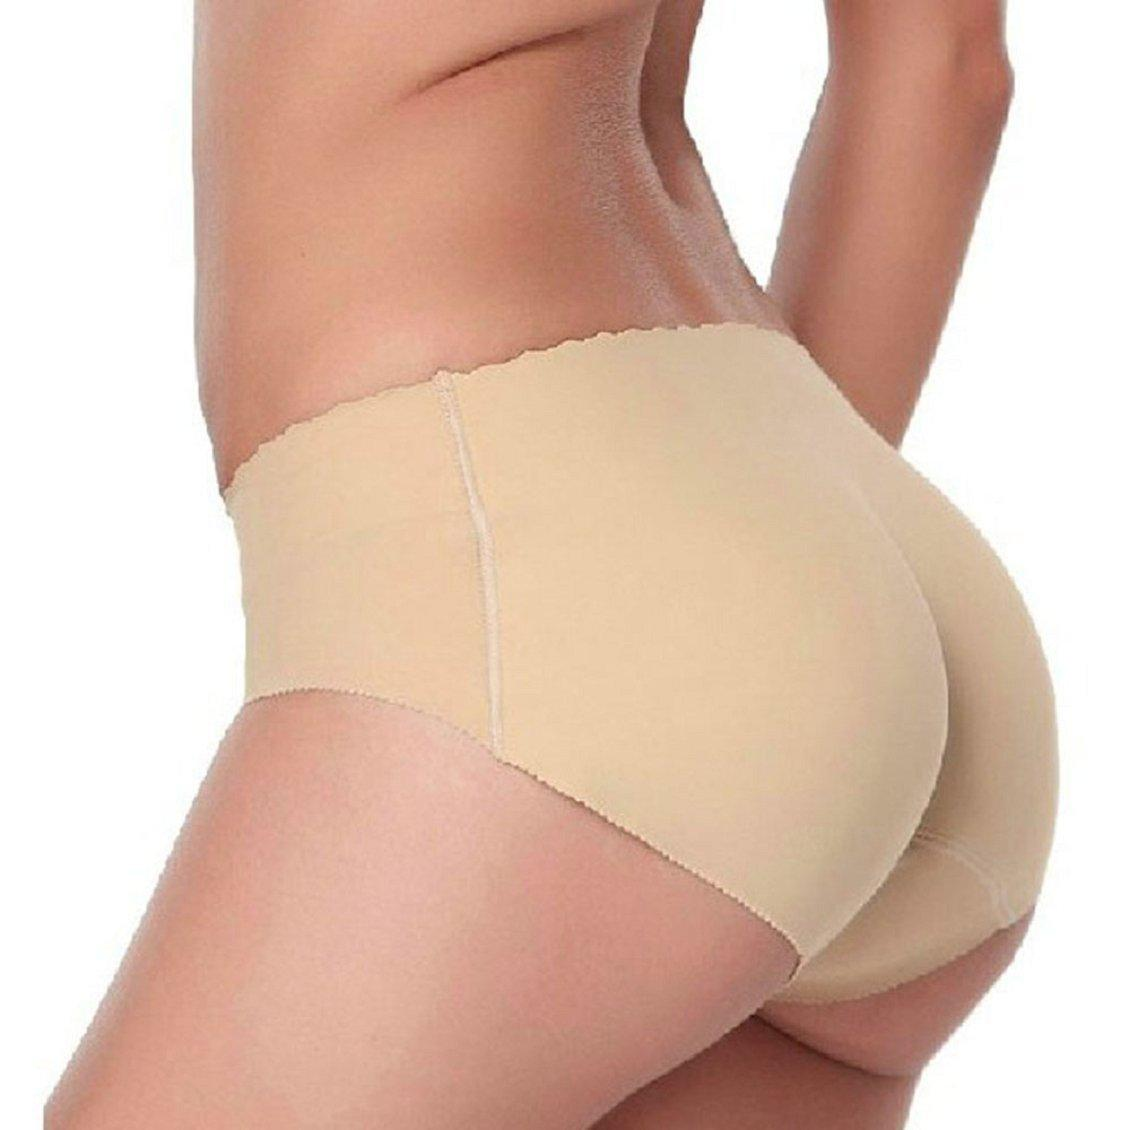 cf4c7f9c67d8 Wholesale- 2Pcs Seamless Briefs Women's Panties Ladies Panties Bottom Pad  Panty Sexy Underwear Buttock Up Pants Women Body Shaping Panty